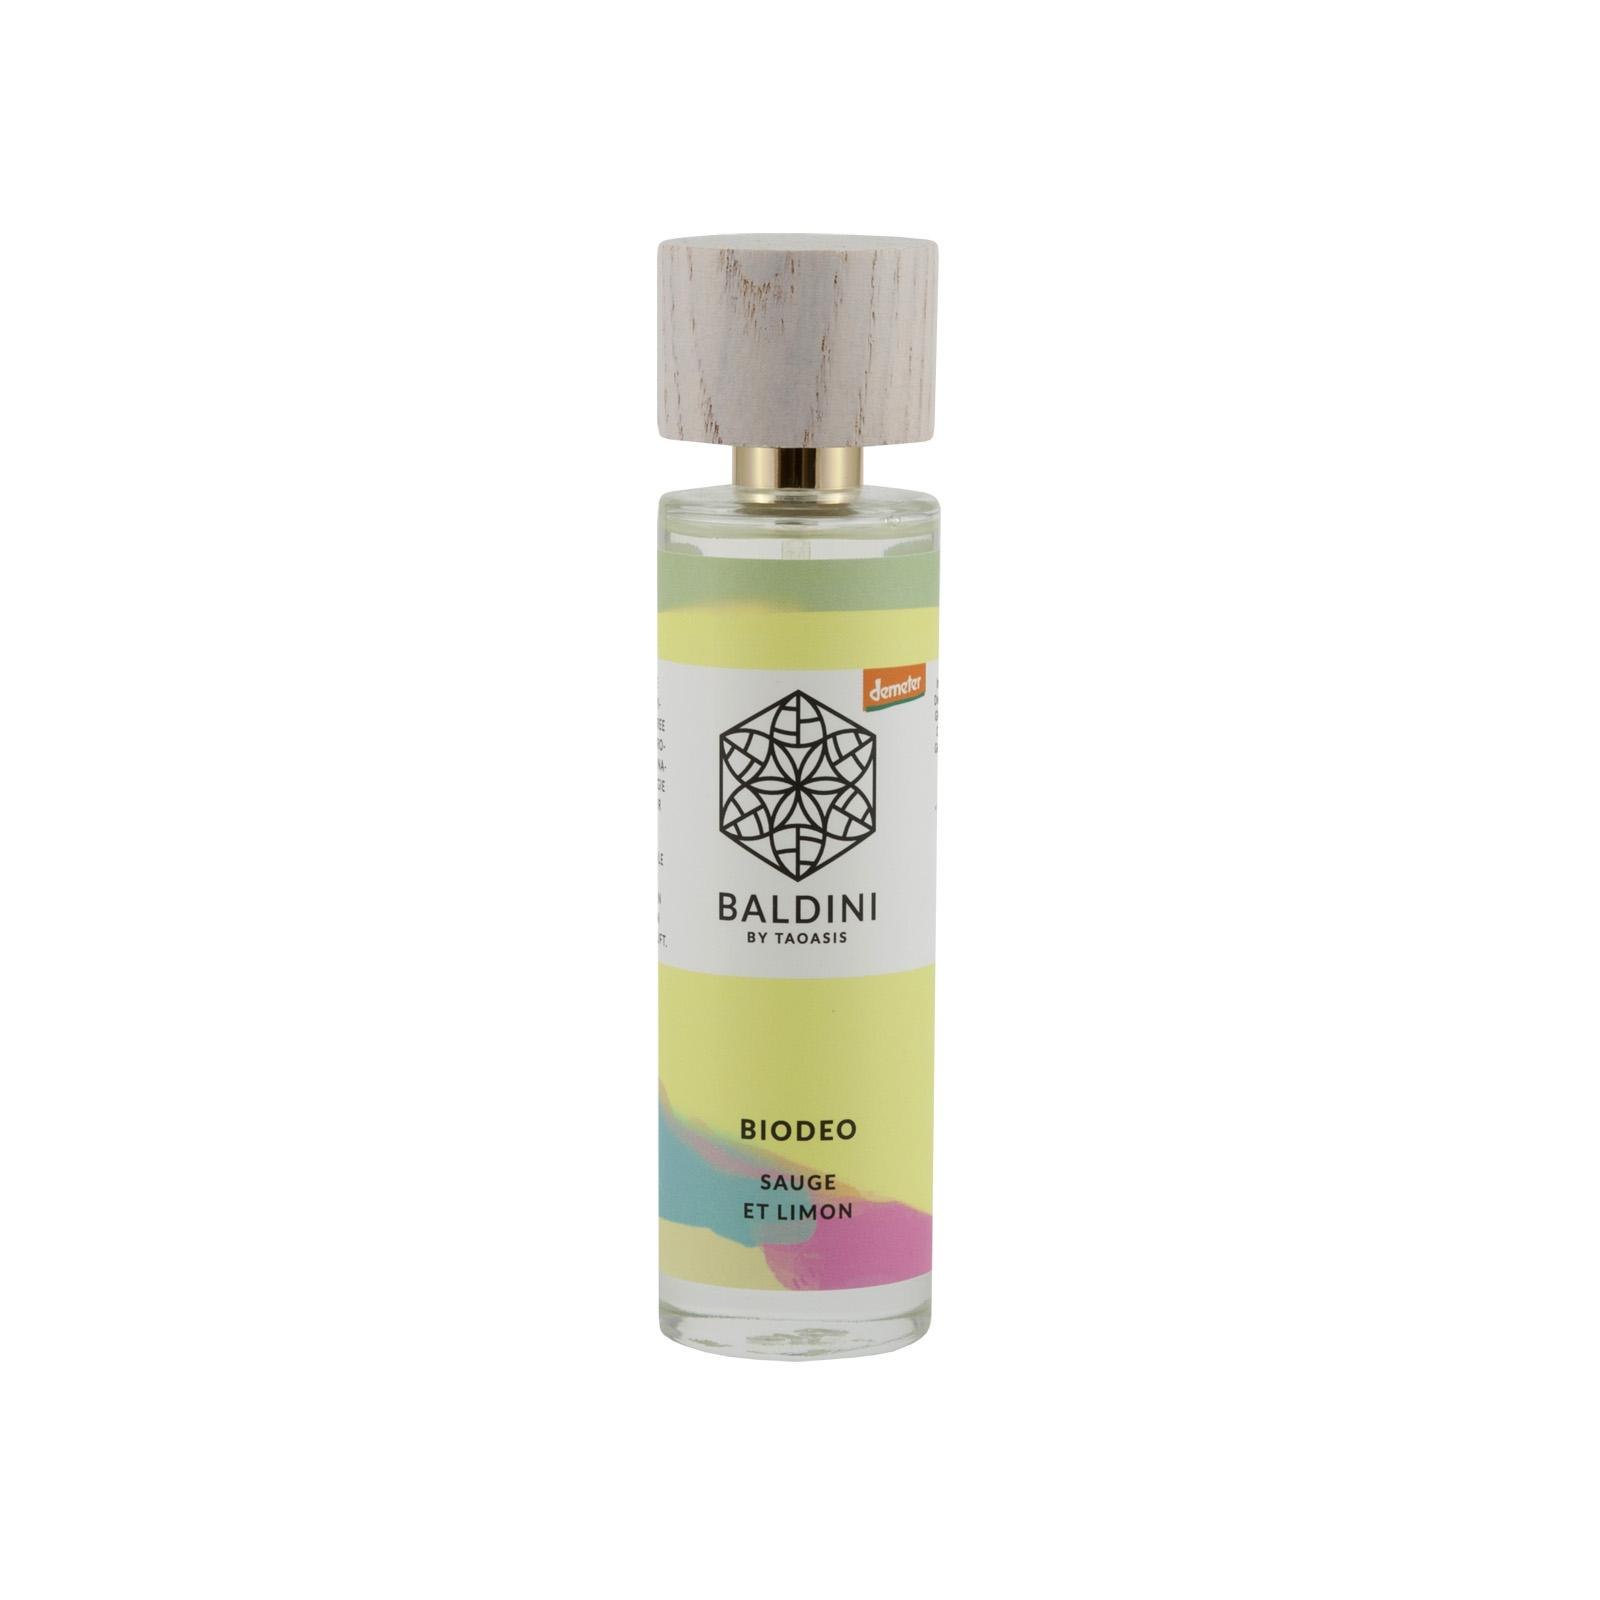 Taoasis Deodorant sprej Sauge et Limon, Baldini 70 ml